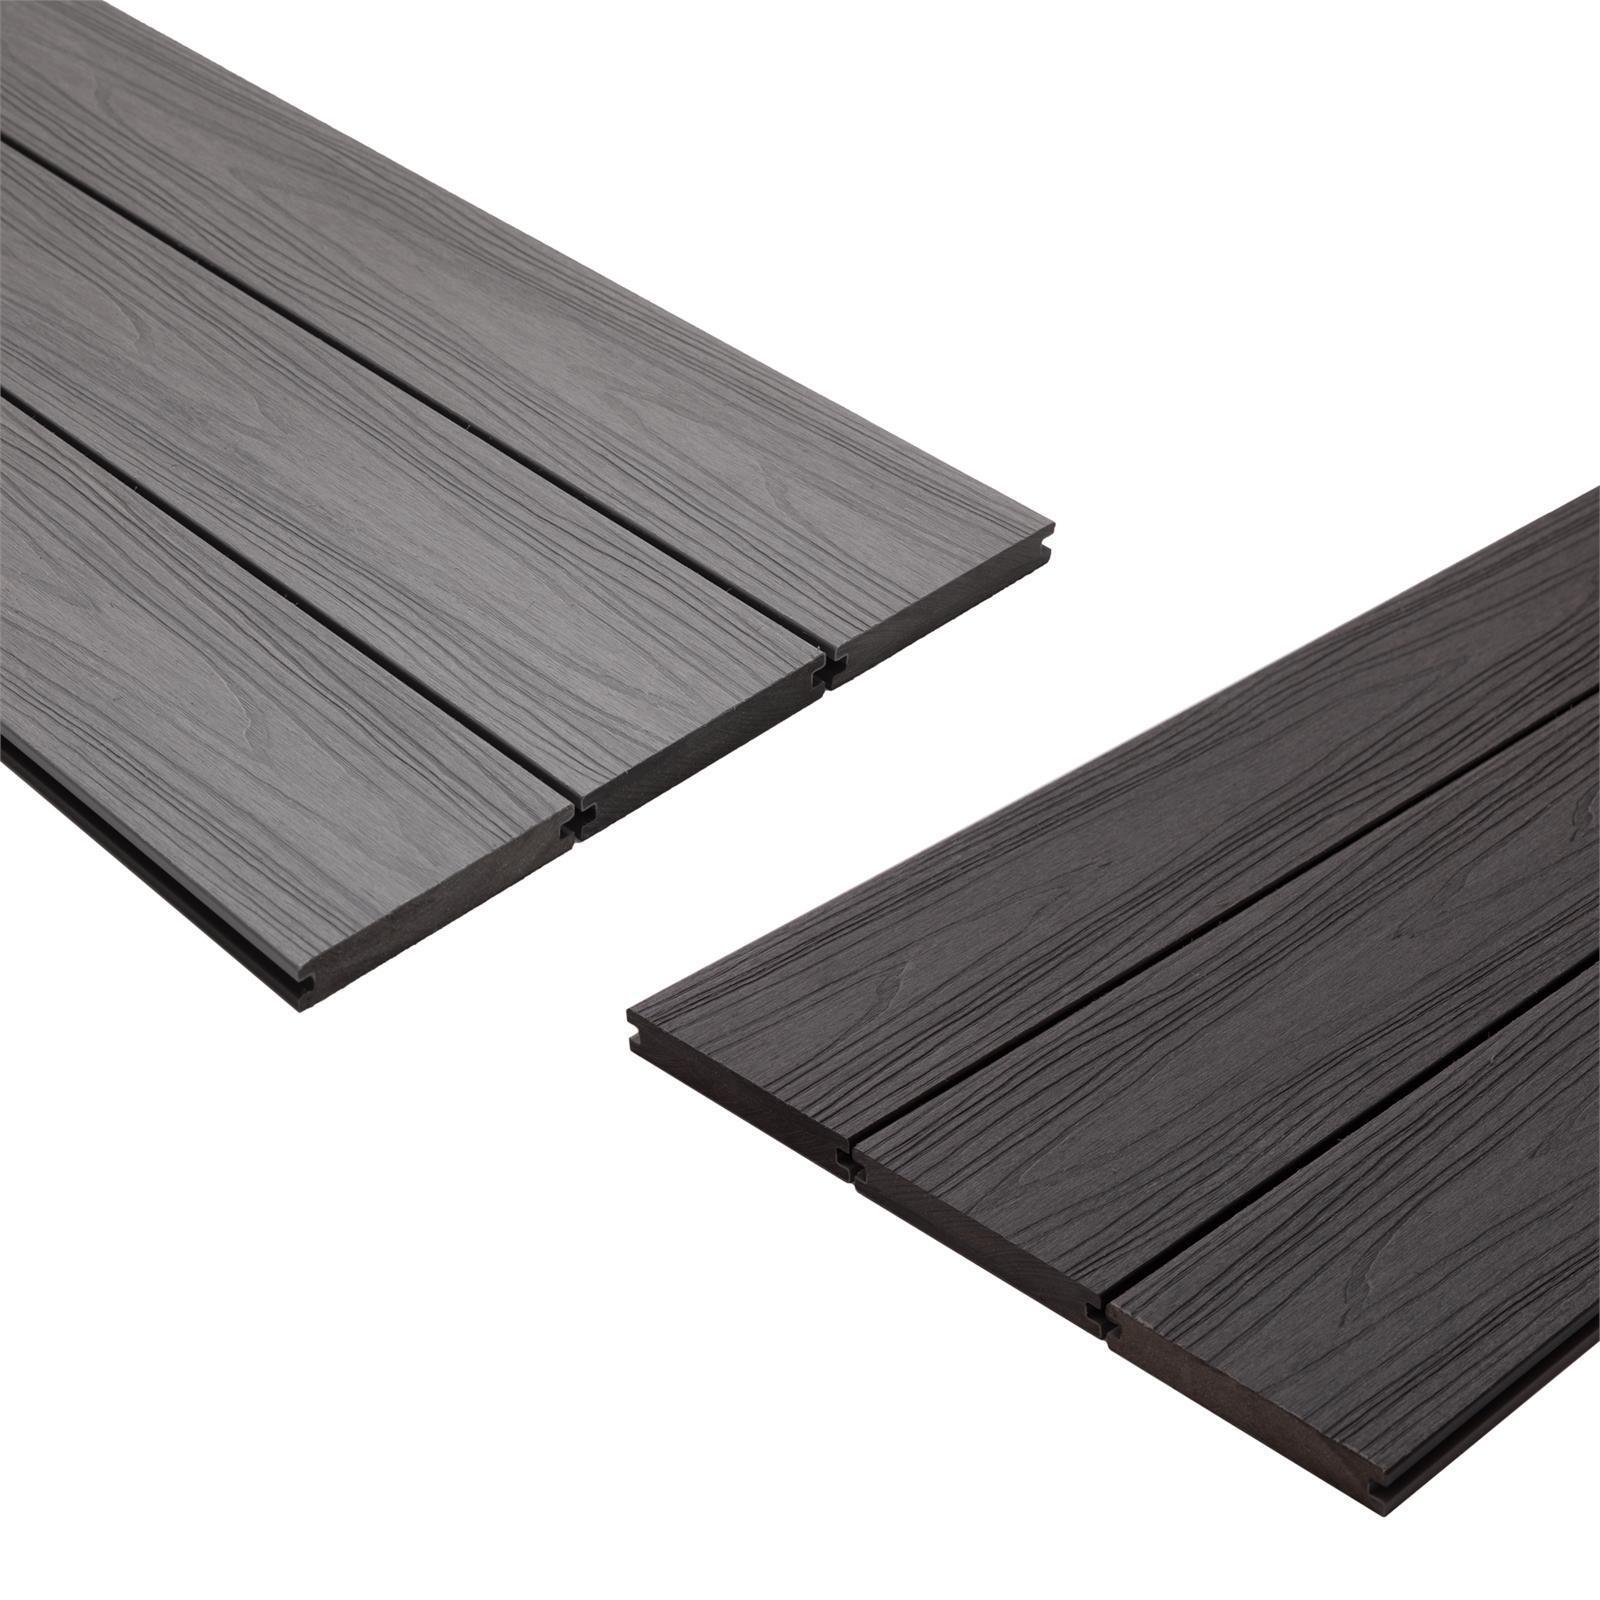 Ekodeck 137 x 23 x 5400mm Alpine Ash / Ironwood Plus Designer Series Composite Decking